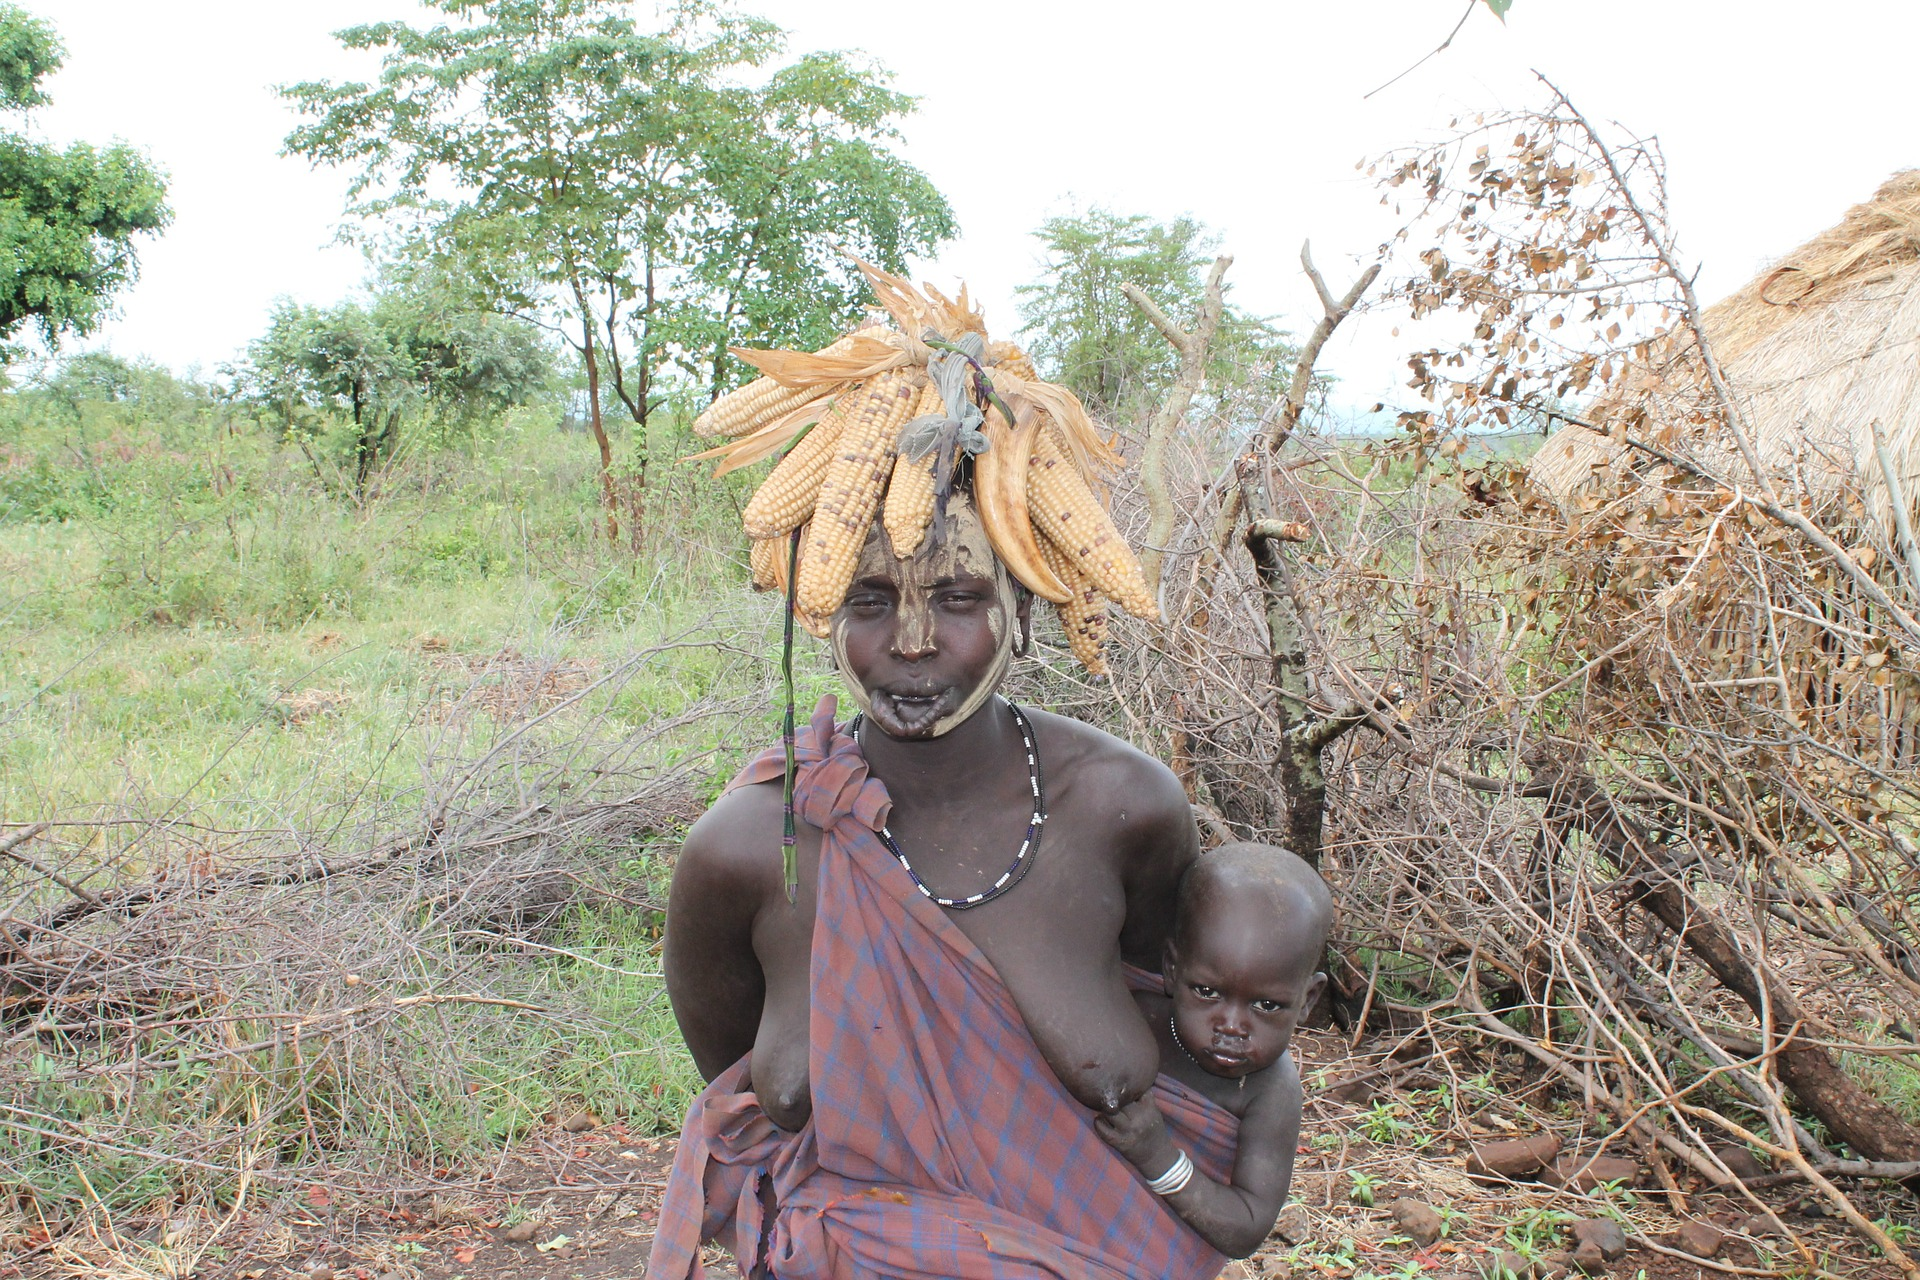 Éthiopie : les tribus de l'Omo